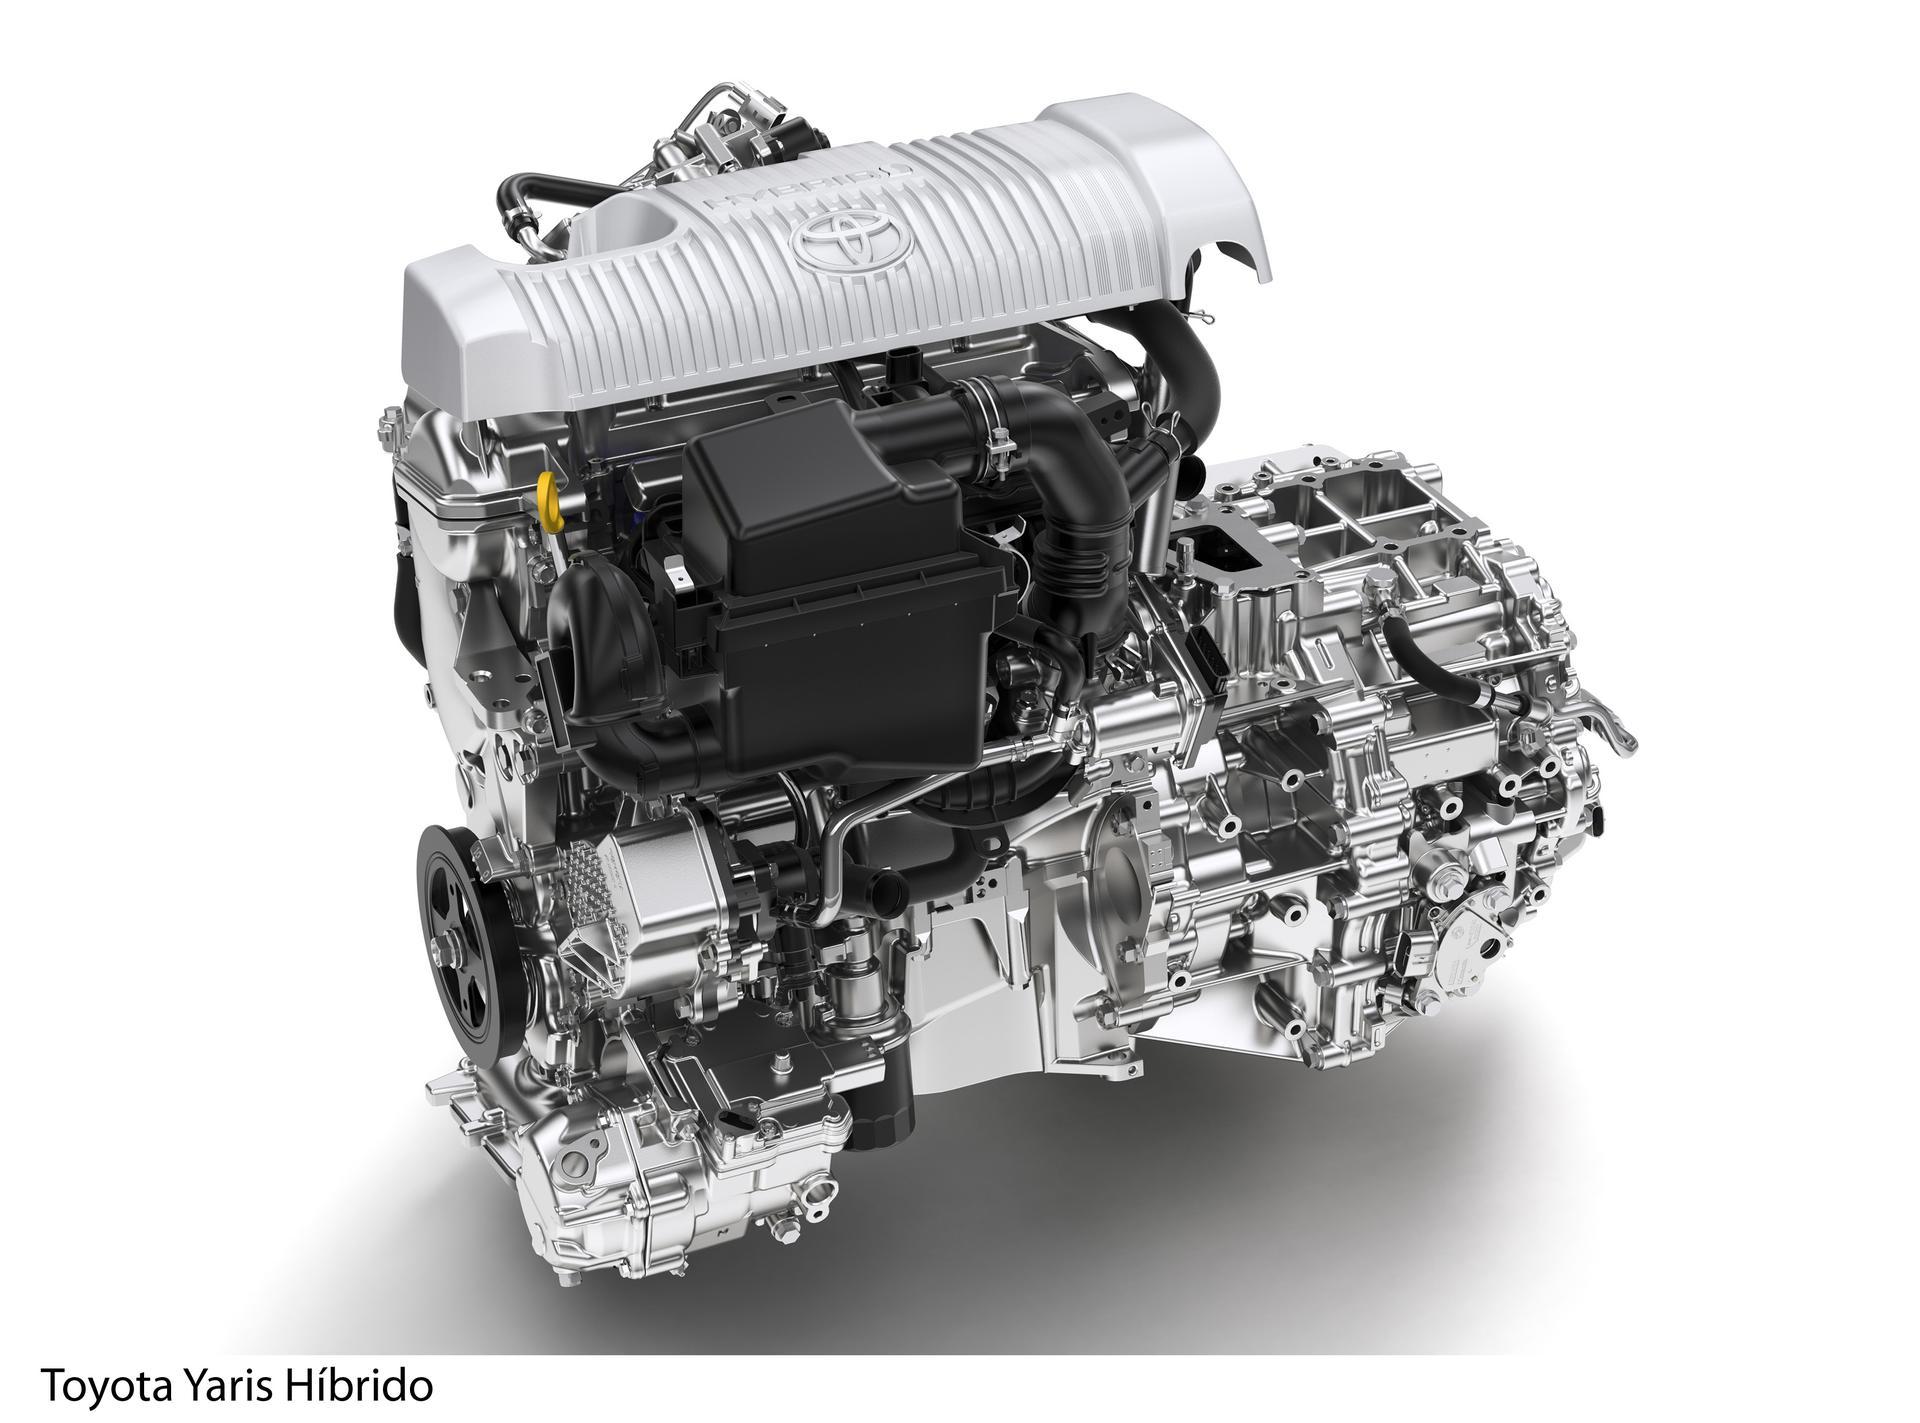 1920_Yaris_Hybrid_Engine_02_v04